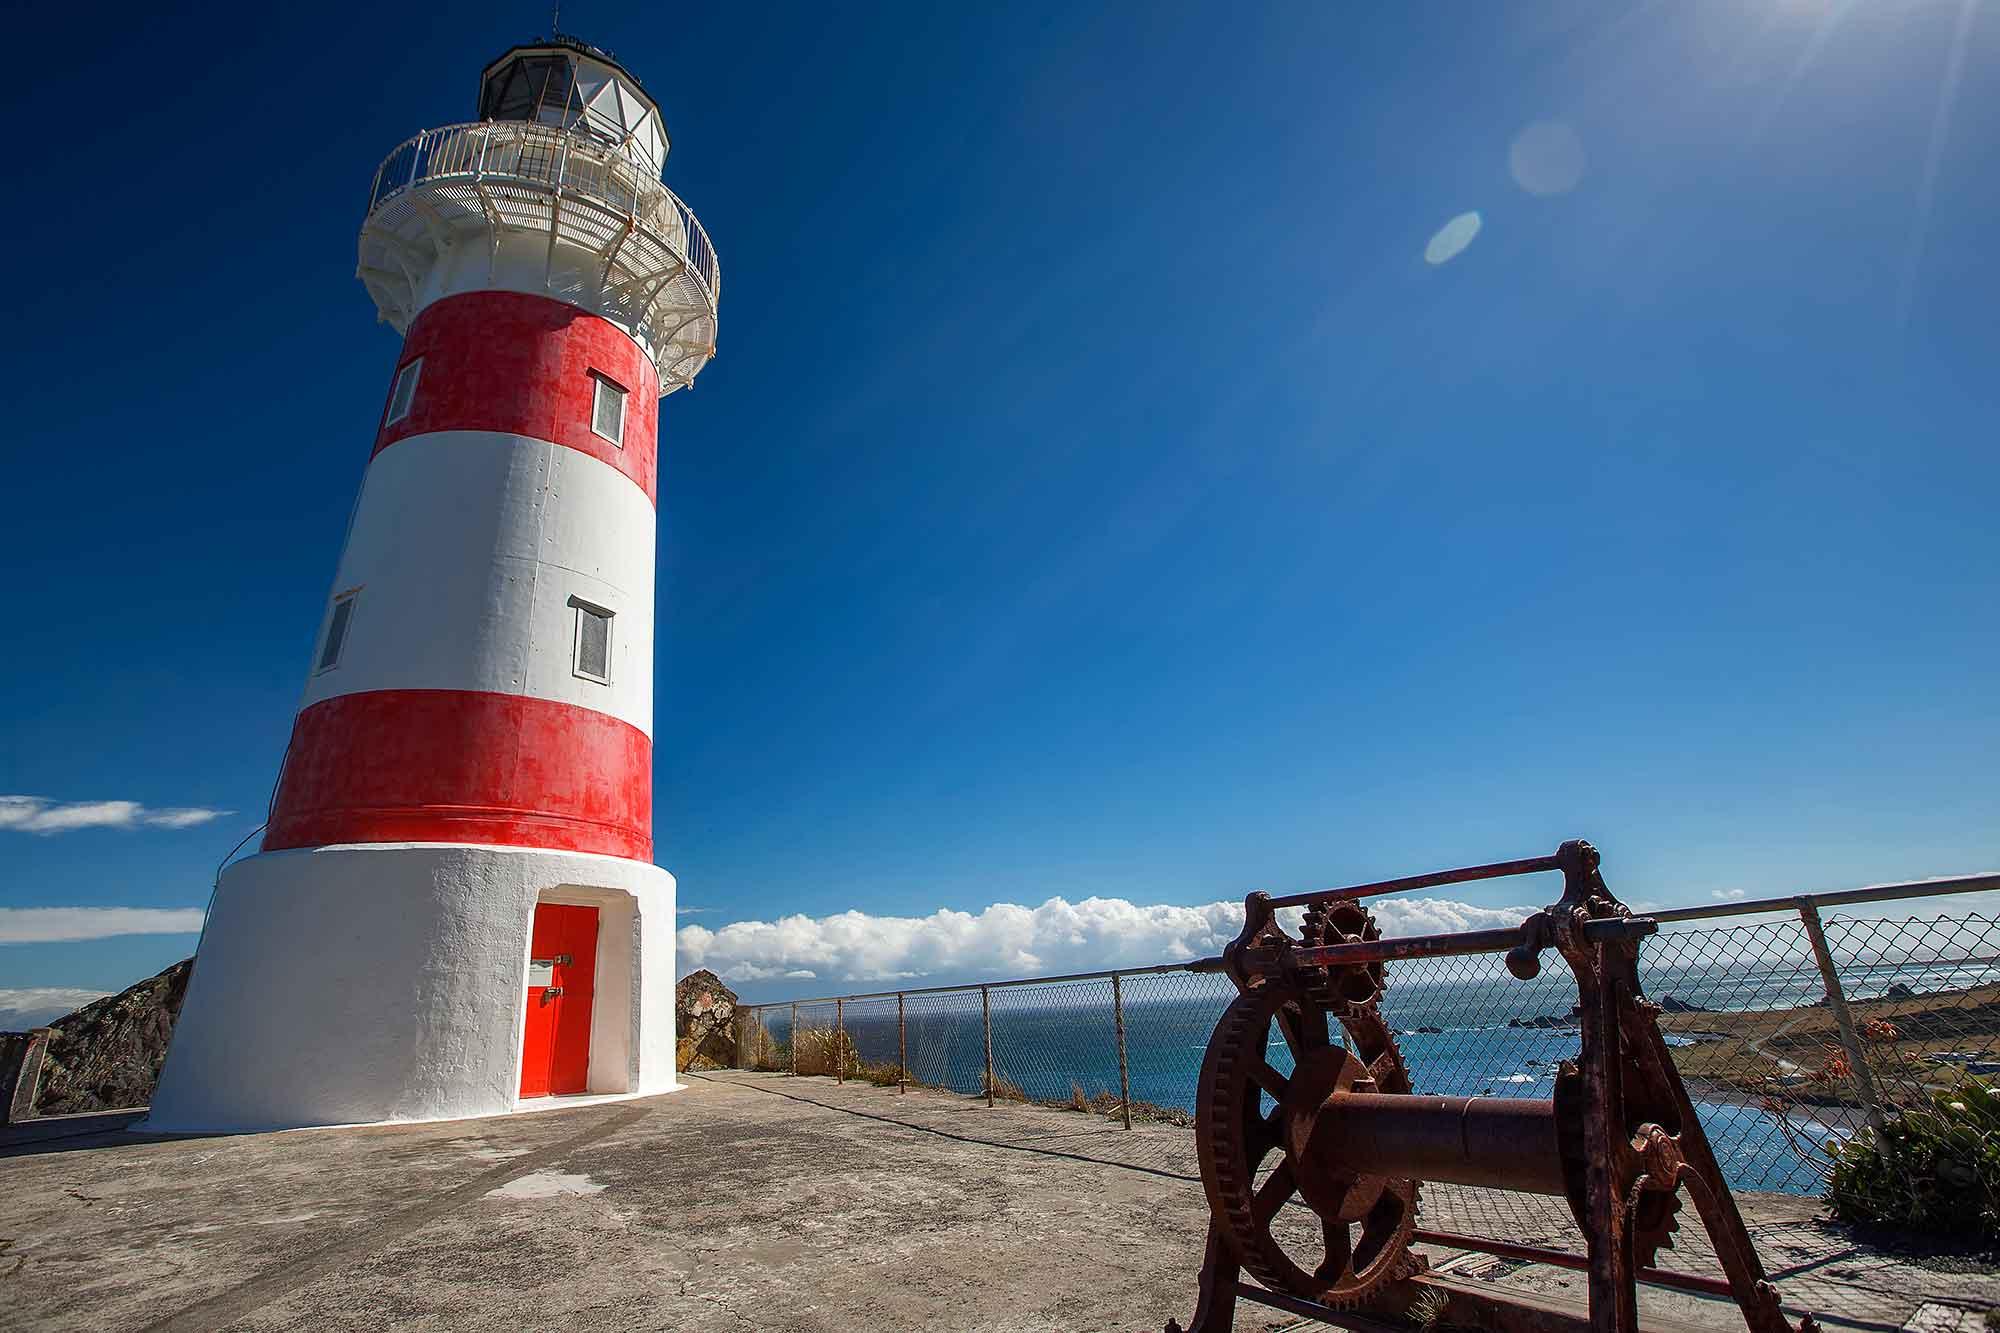 The lighthouse on Cape Palliser, New Zealand. © Ulli Maier & Nisa Maier